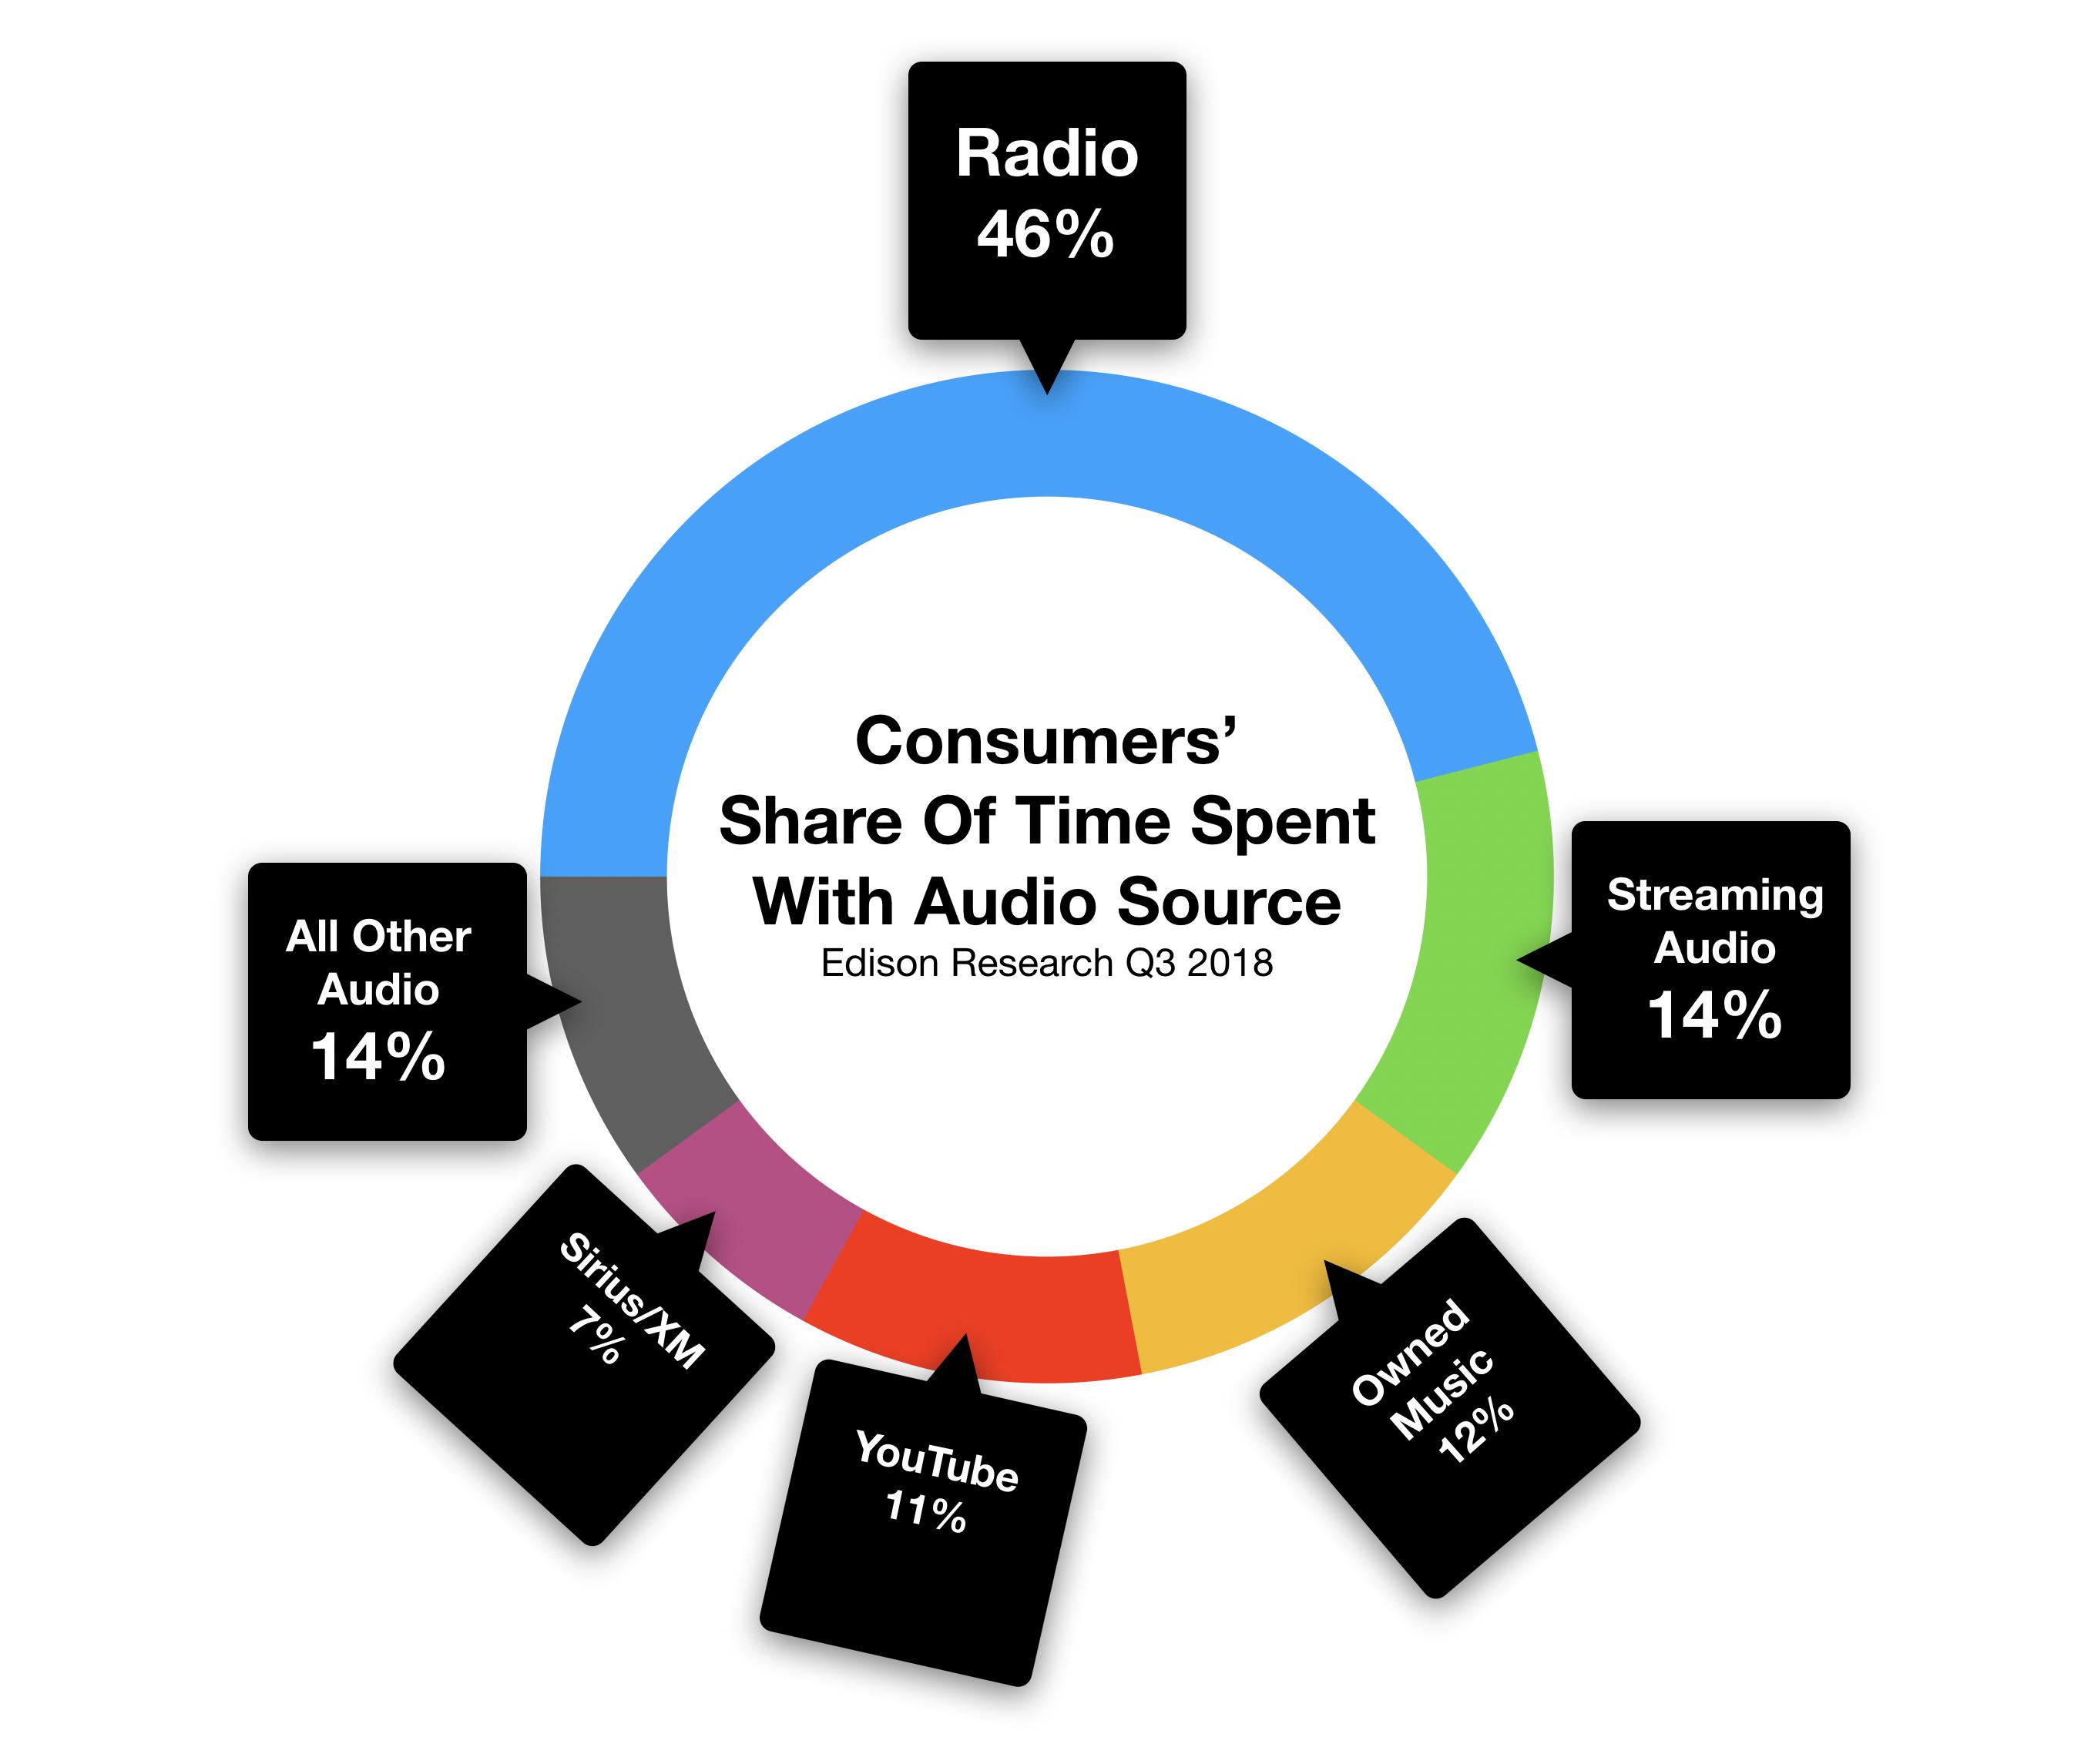 Las Vegas Consumer Share of Audio Time Spent With Radio